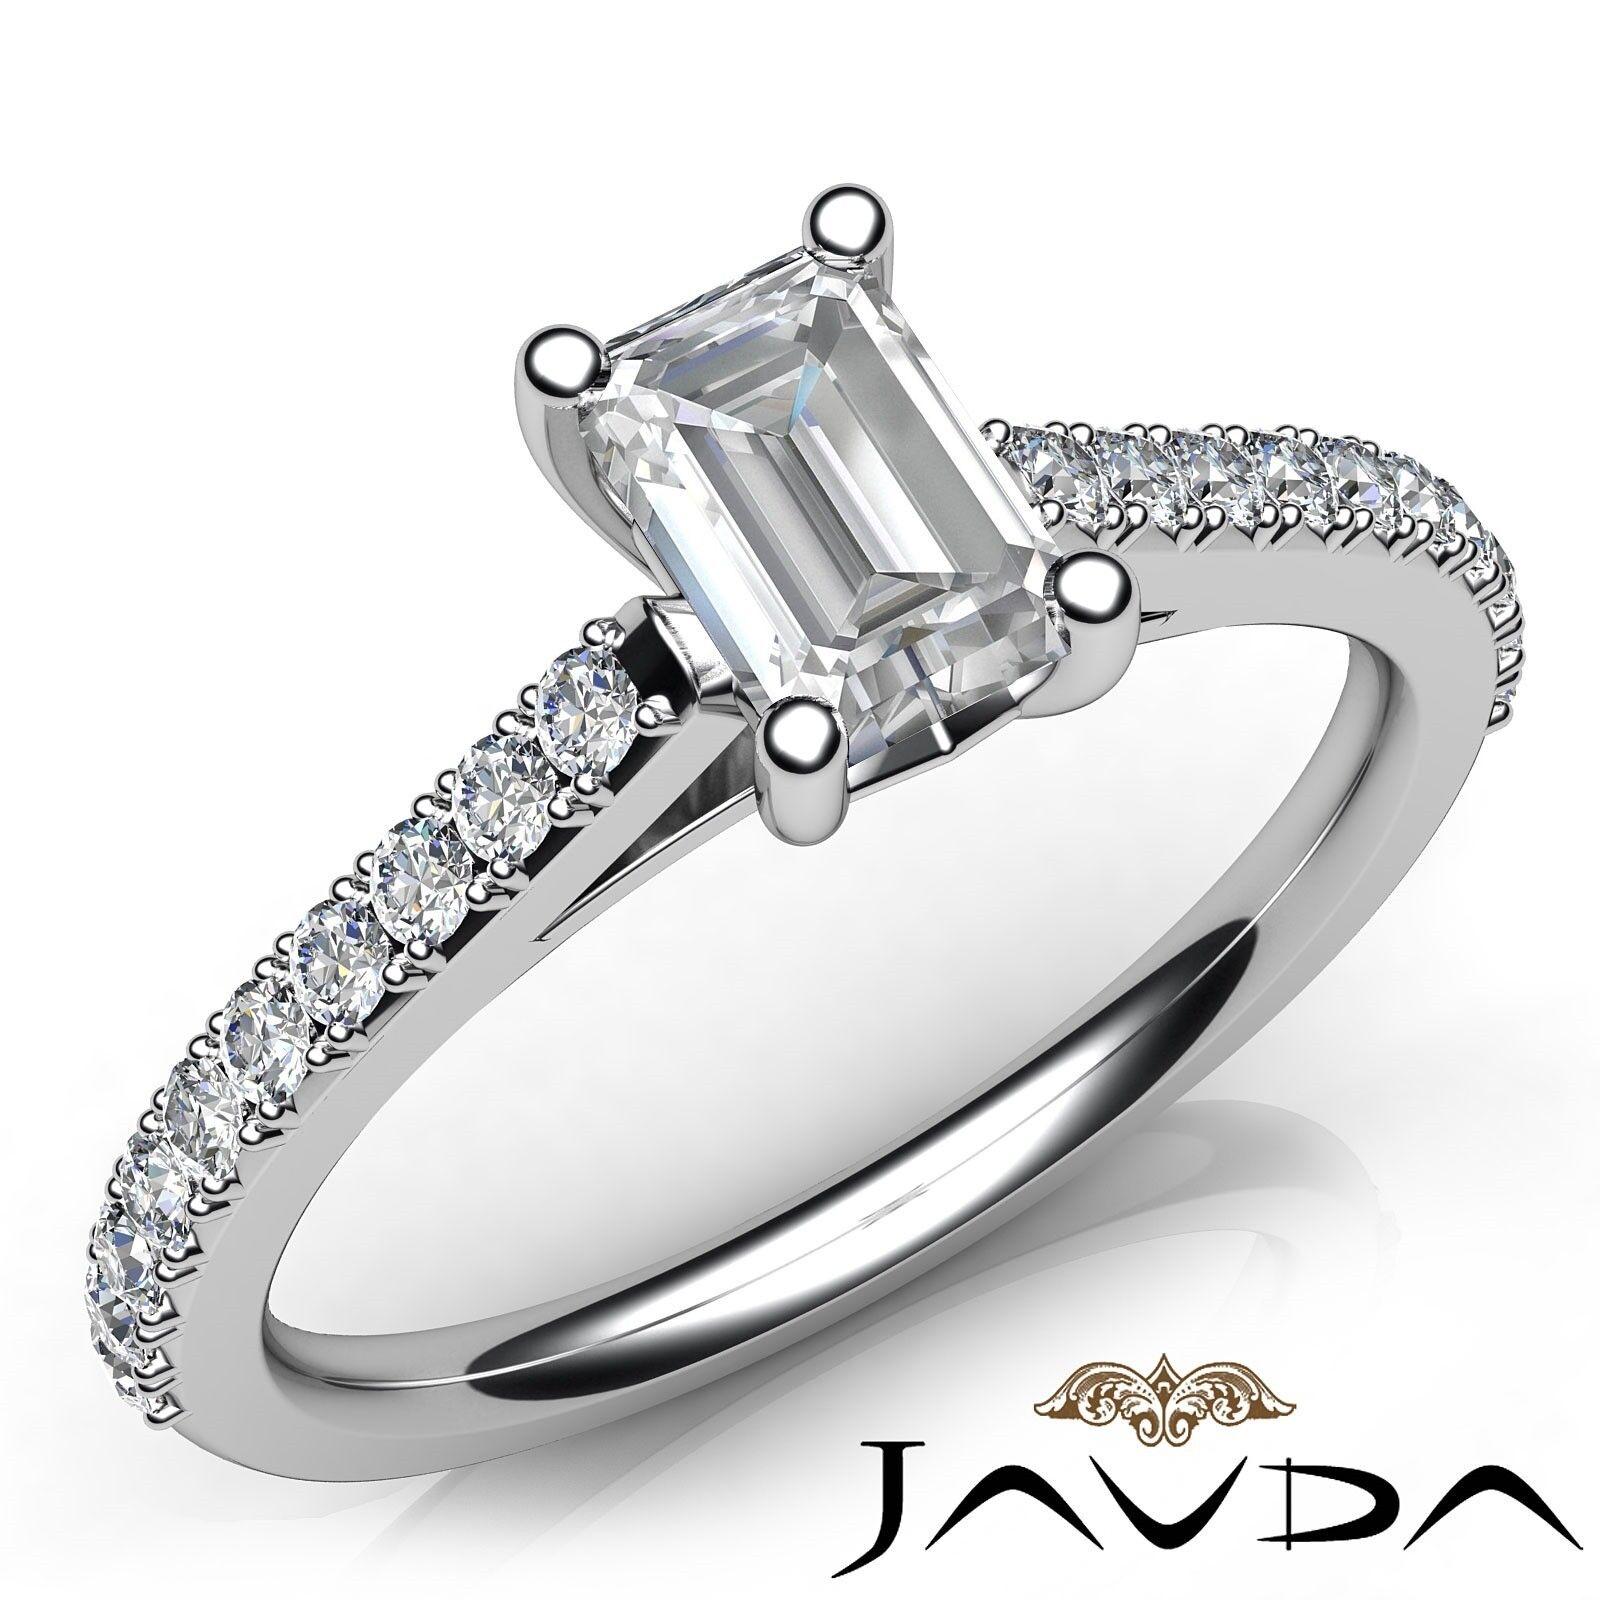 1.3ctw Classic Prong Set Emerald Diamond Engagement Javda Ring GIA H-VVS2 W Gold